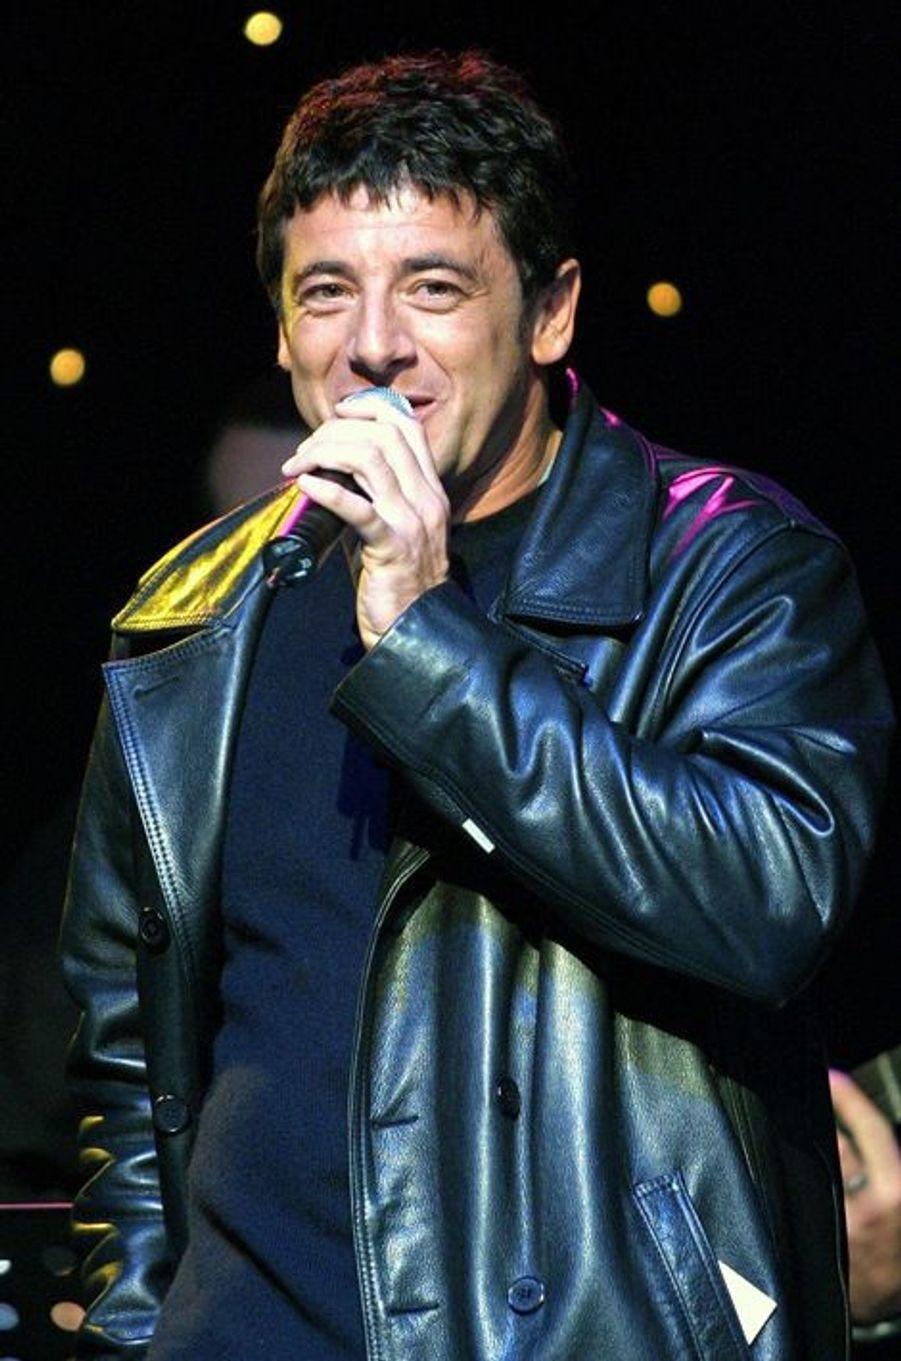 Patrick Bruel à Paris le 12 novembre 2001.